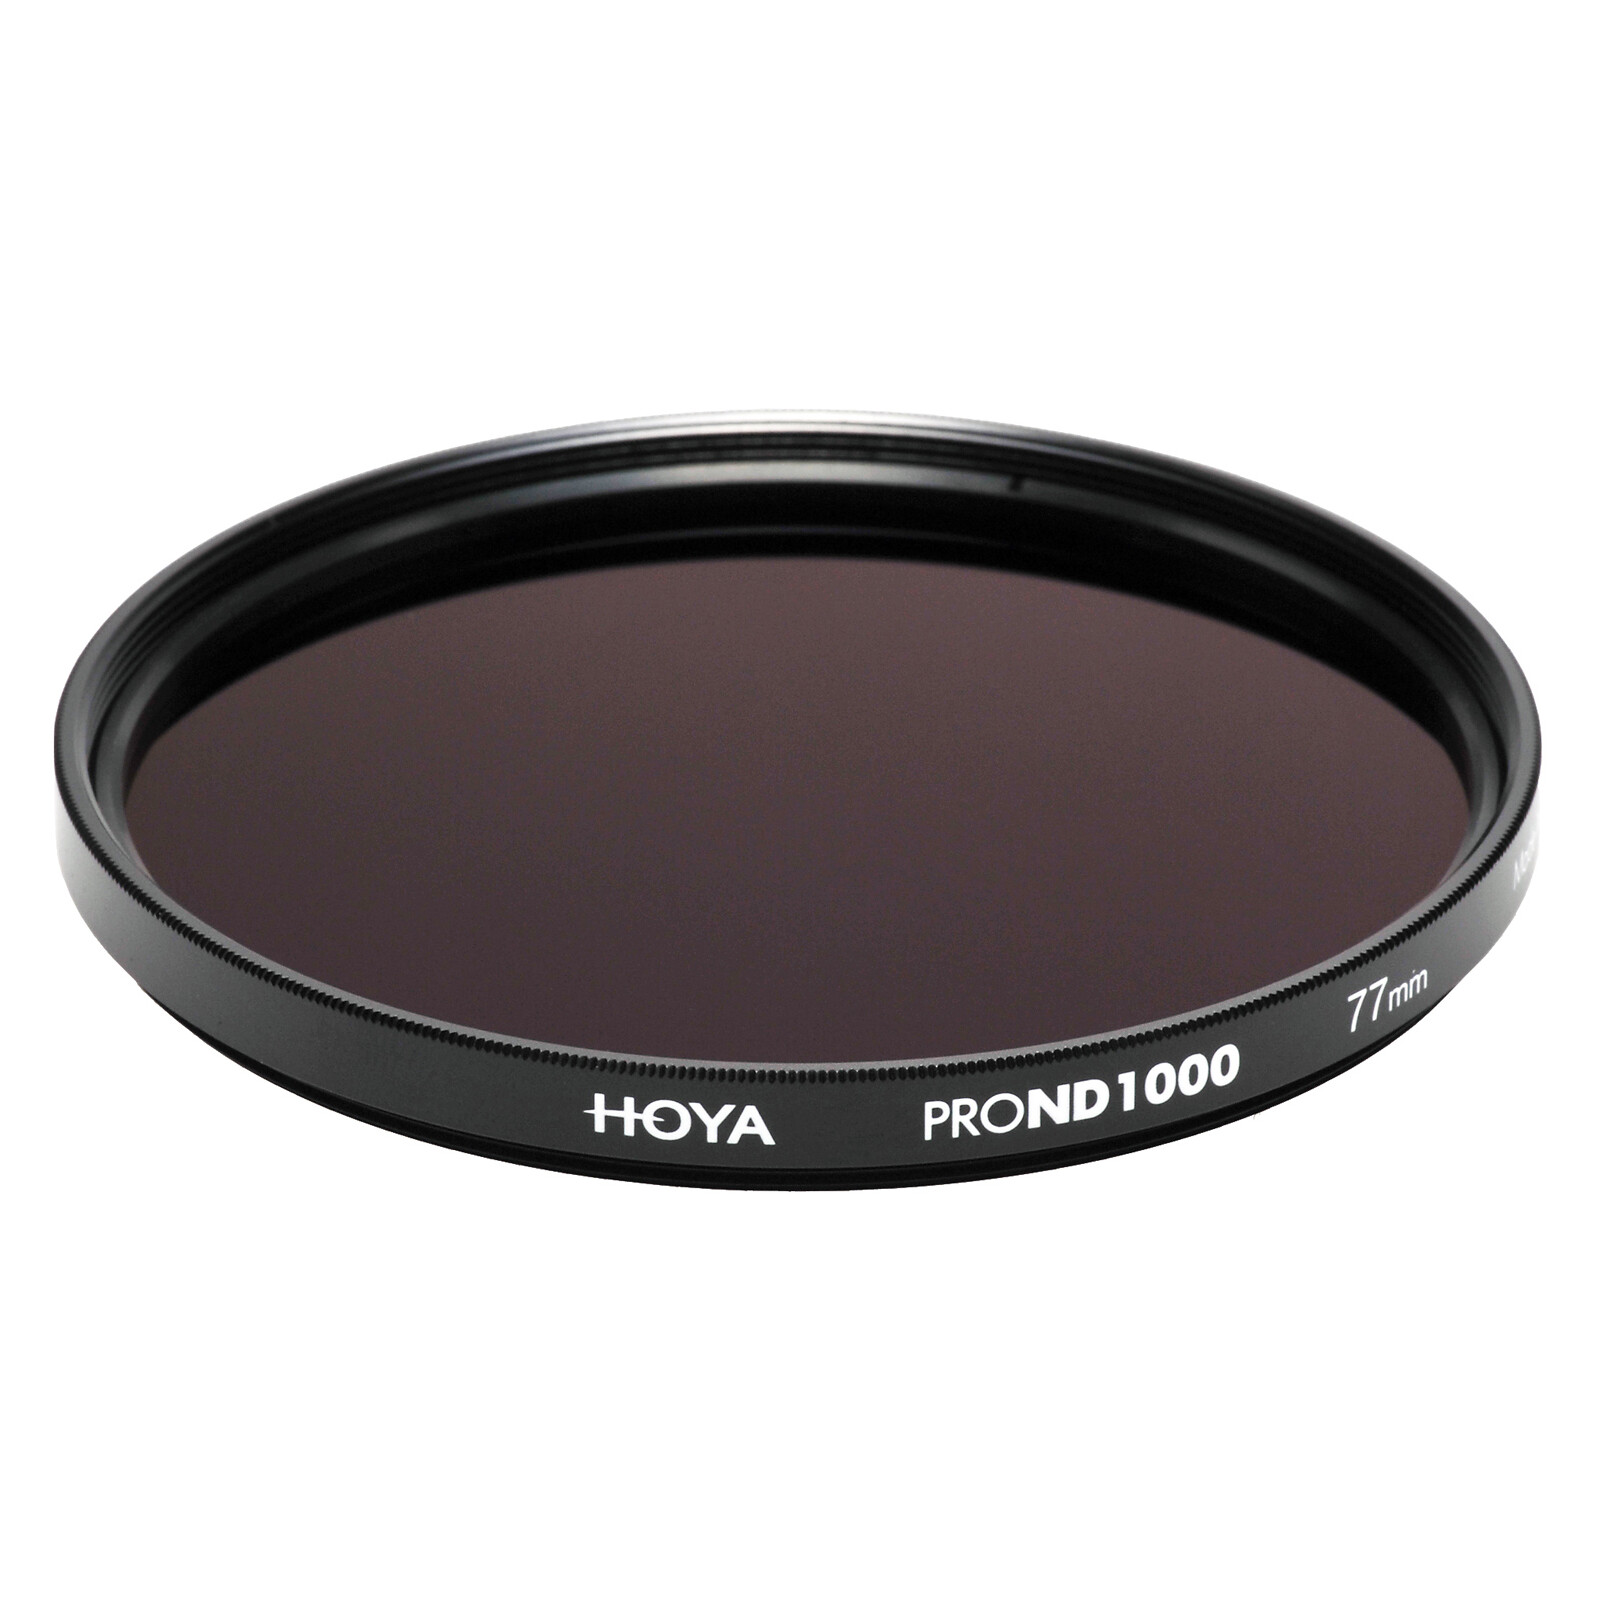 Hoya Grau PRO ND 1000 82mm